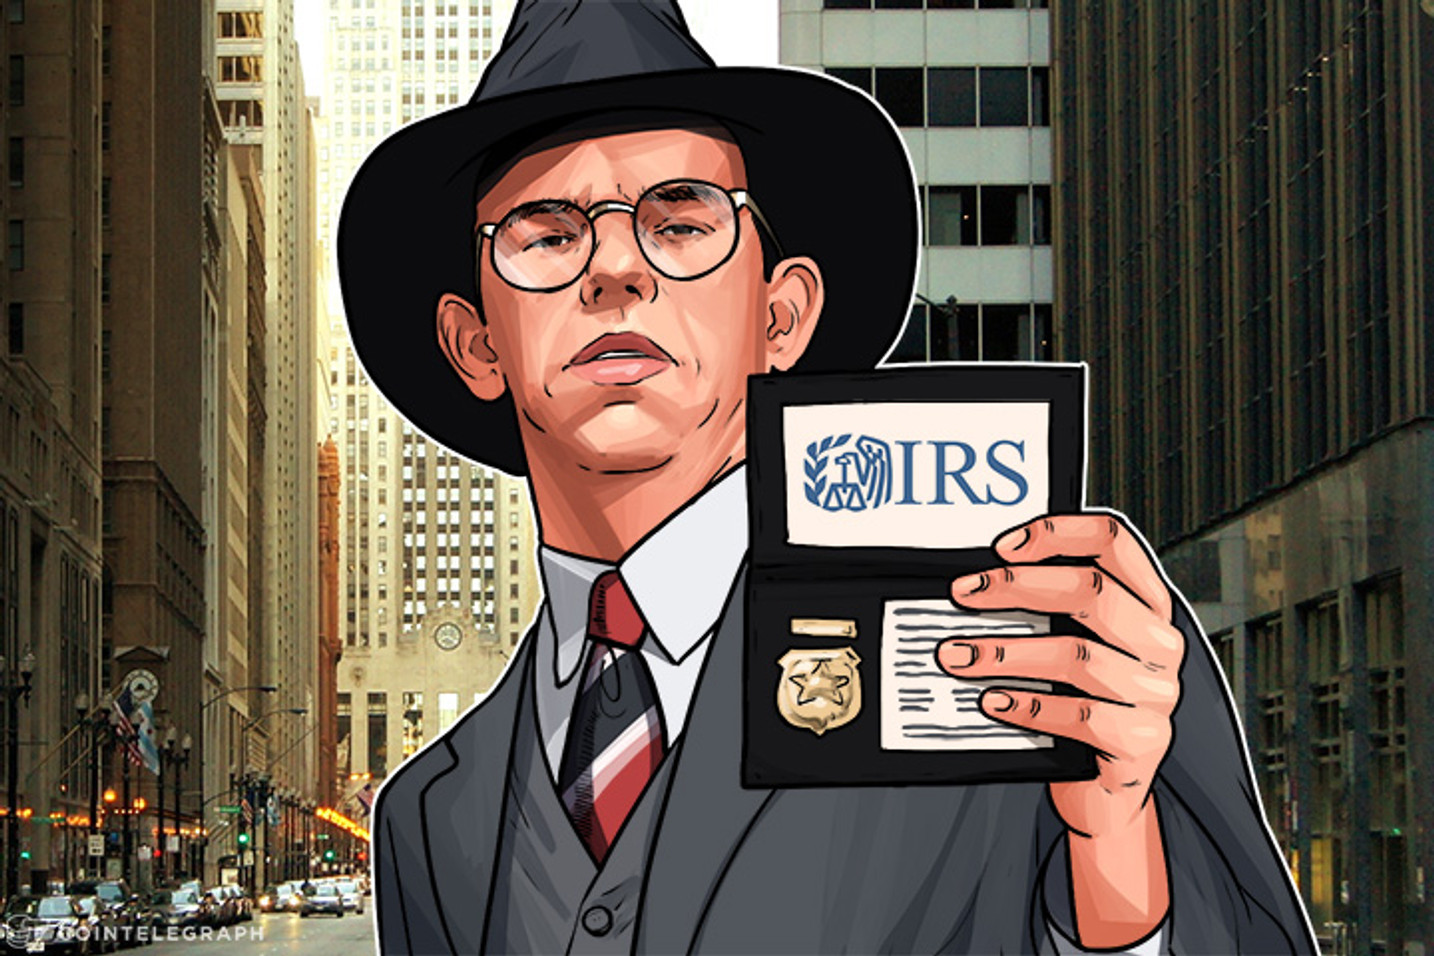 IRS a punto de ir tras Bitcoin y Bitcoin Cash se beneficia, qué esperar